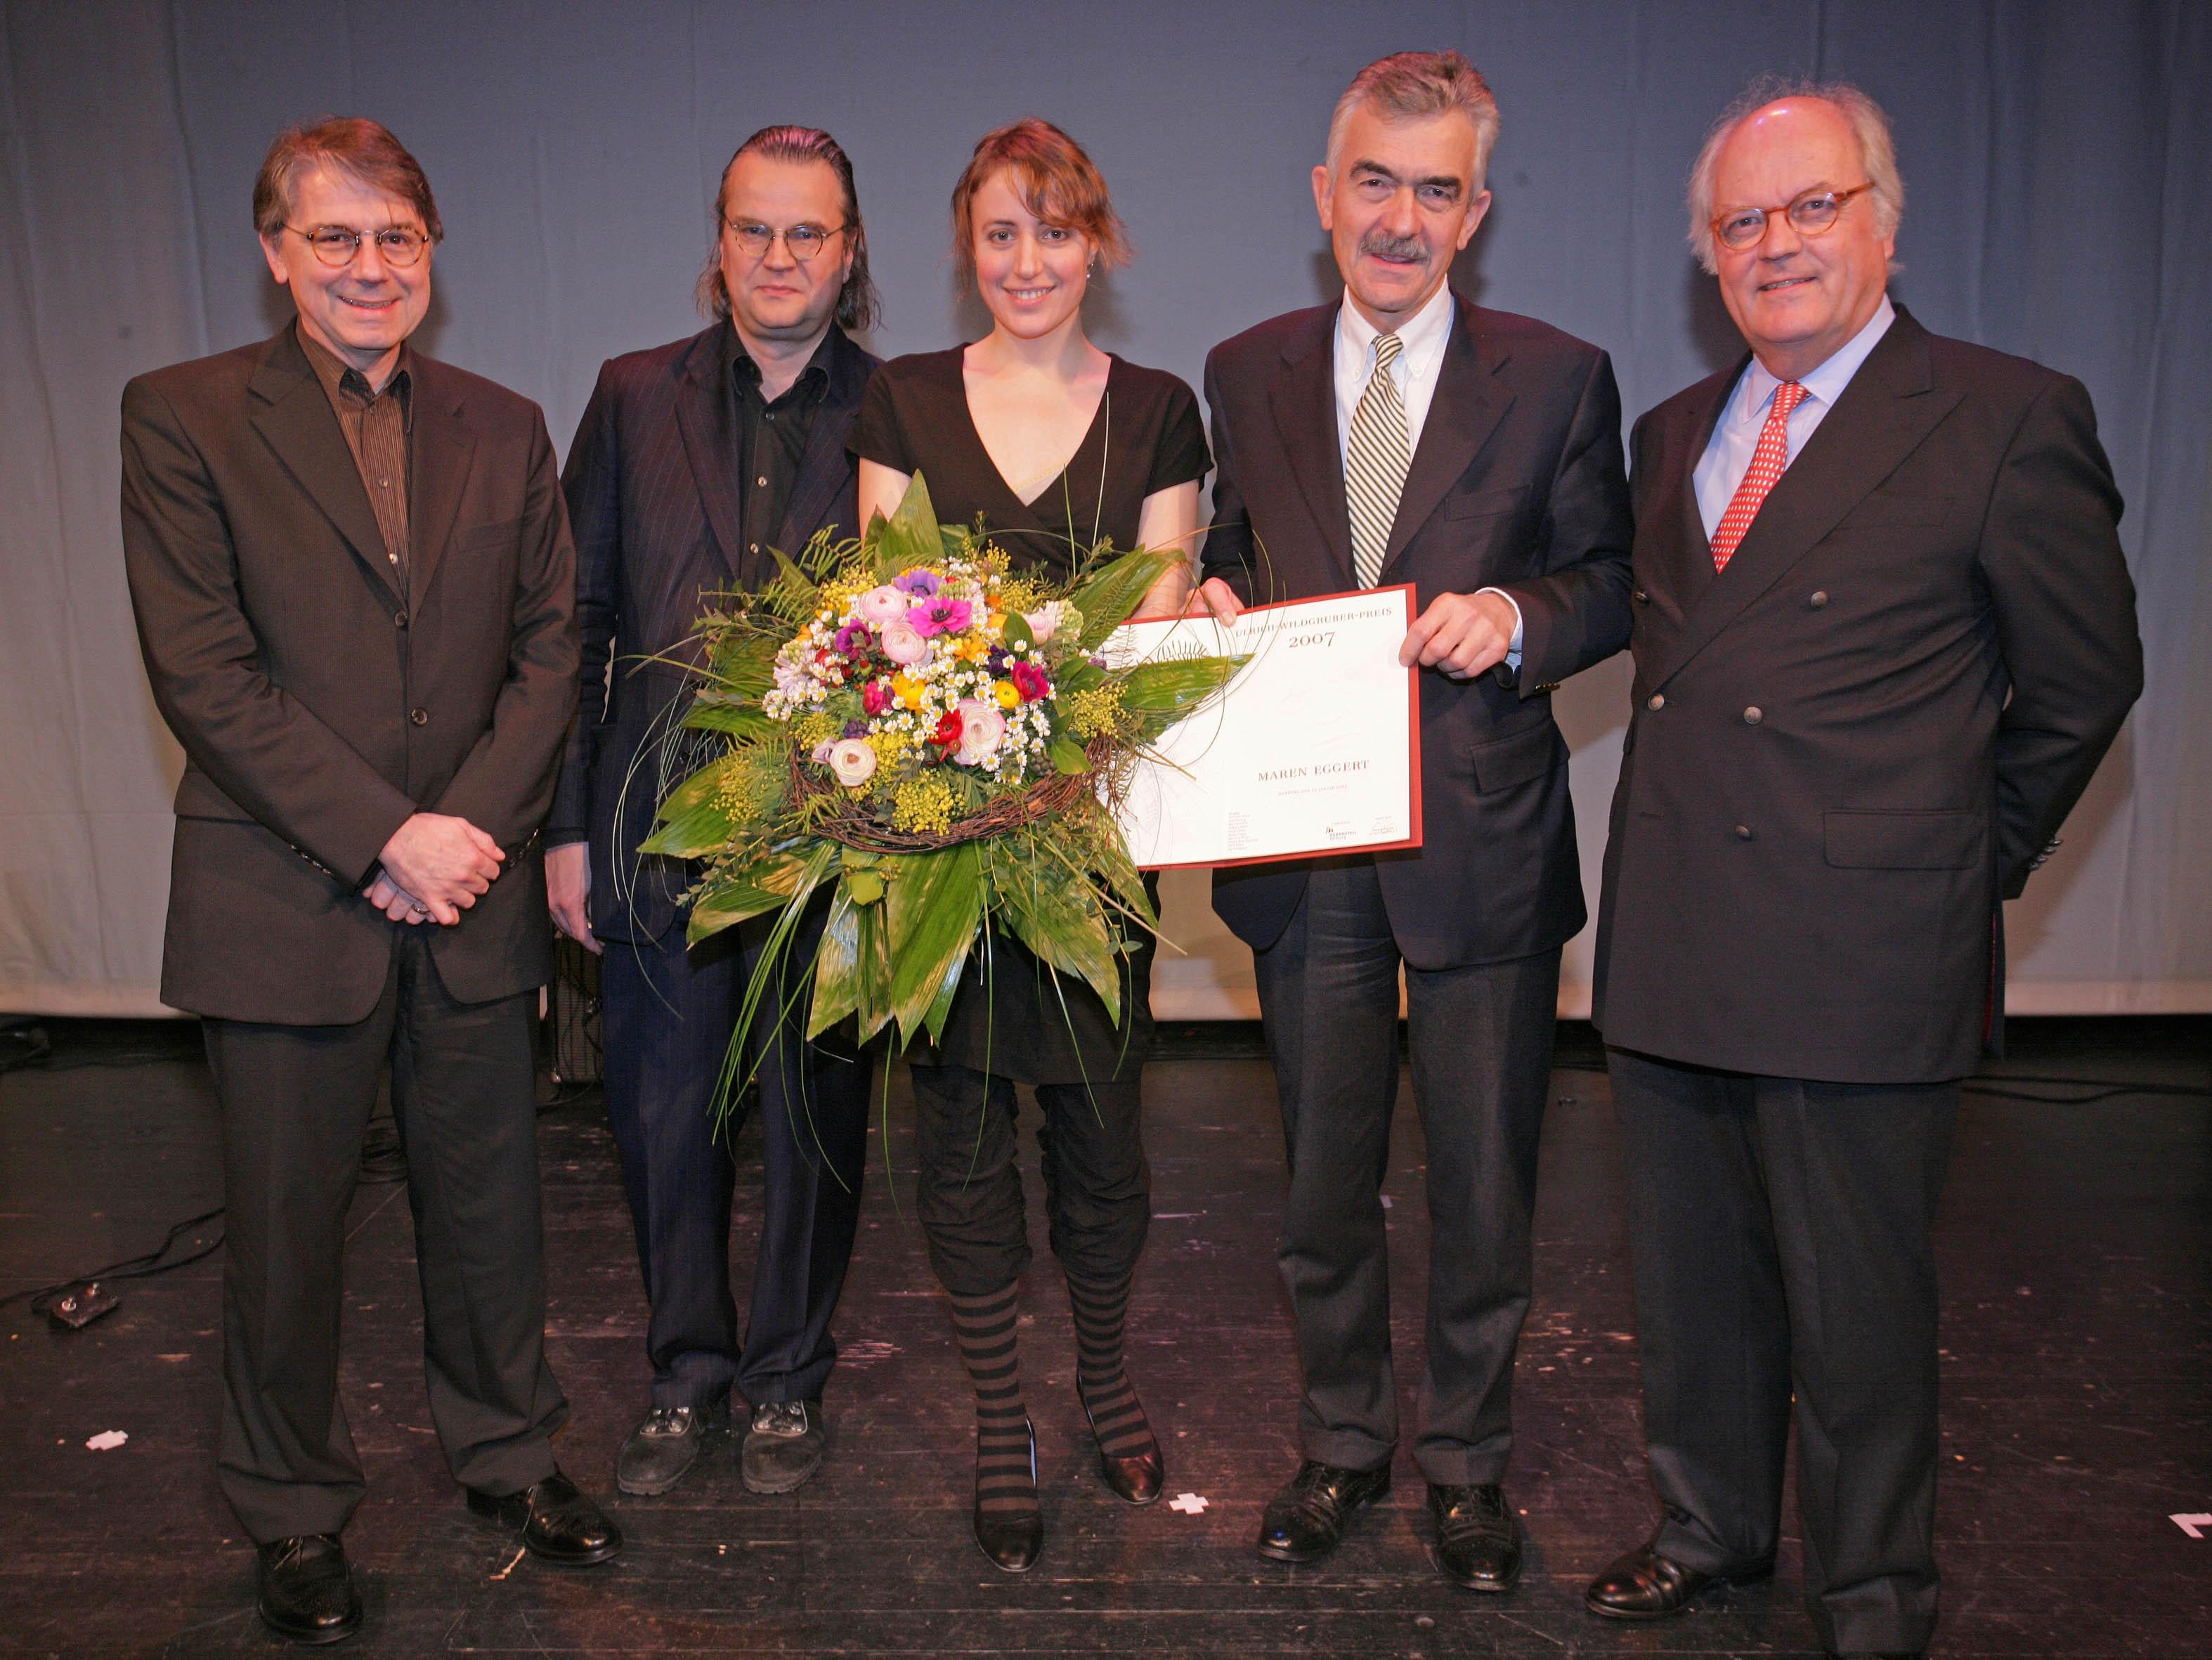 Verleihung Ulrich-Wildgruber-Preis 2007 - v.l.n.r.: Ulrich Khuon, Ulrich Waller, Preisträgerin Maren Eggert, Dr. Thomas Klischan, Claus G. Budelmann